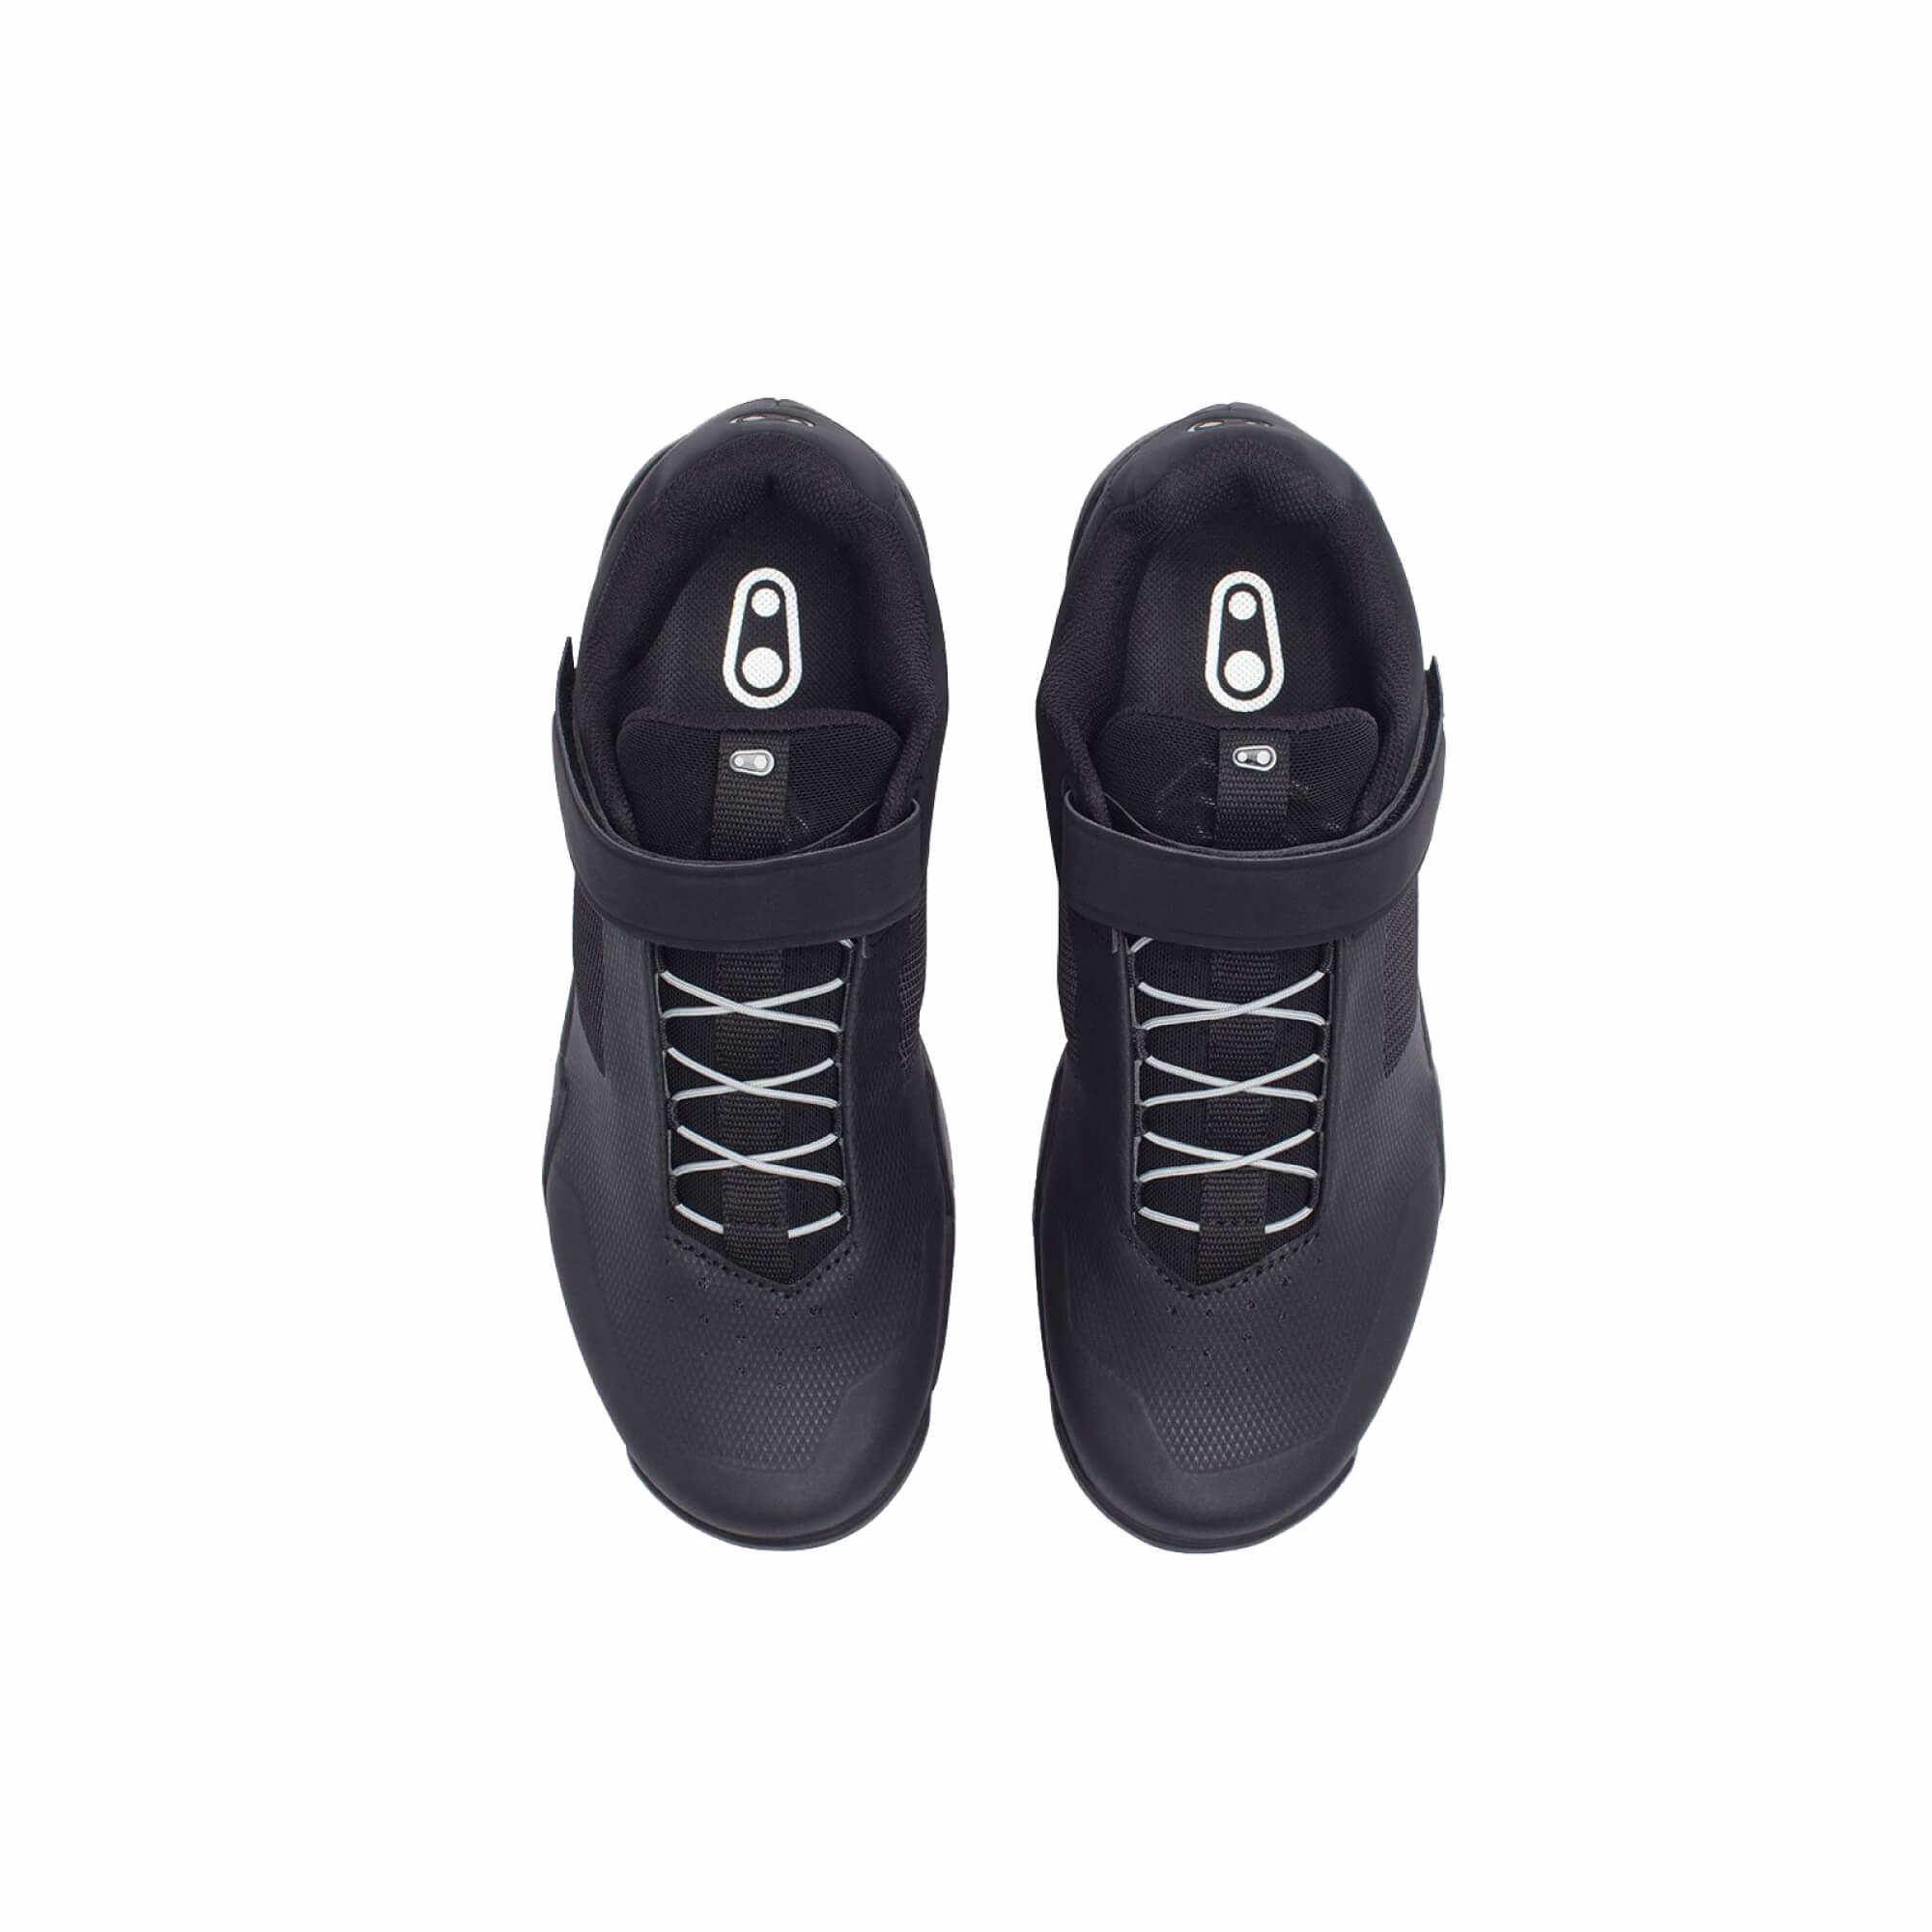 Shoes Mallet Speedlace Clipless Spd-6